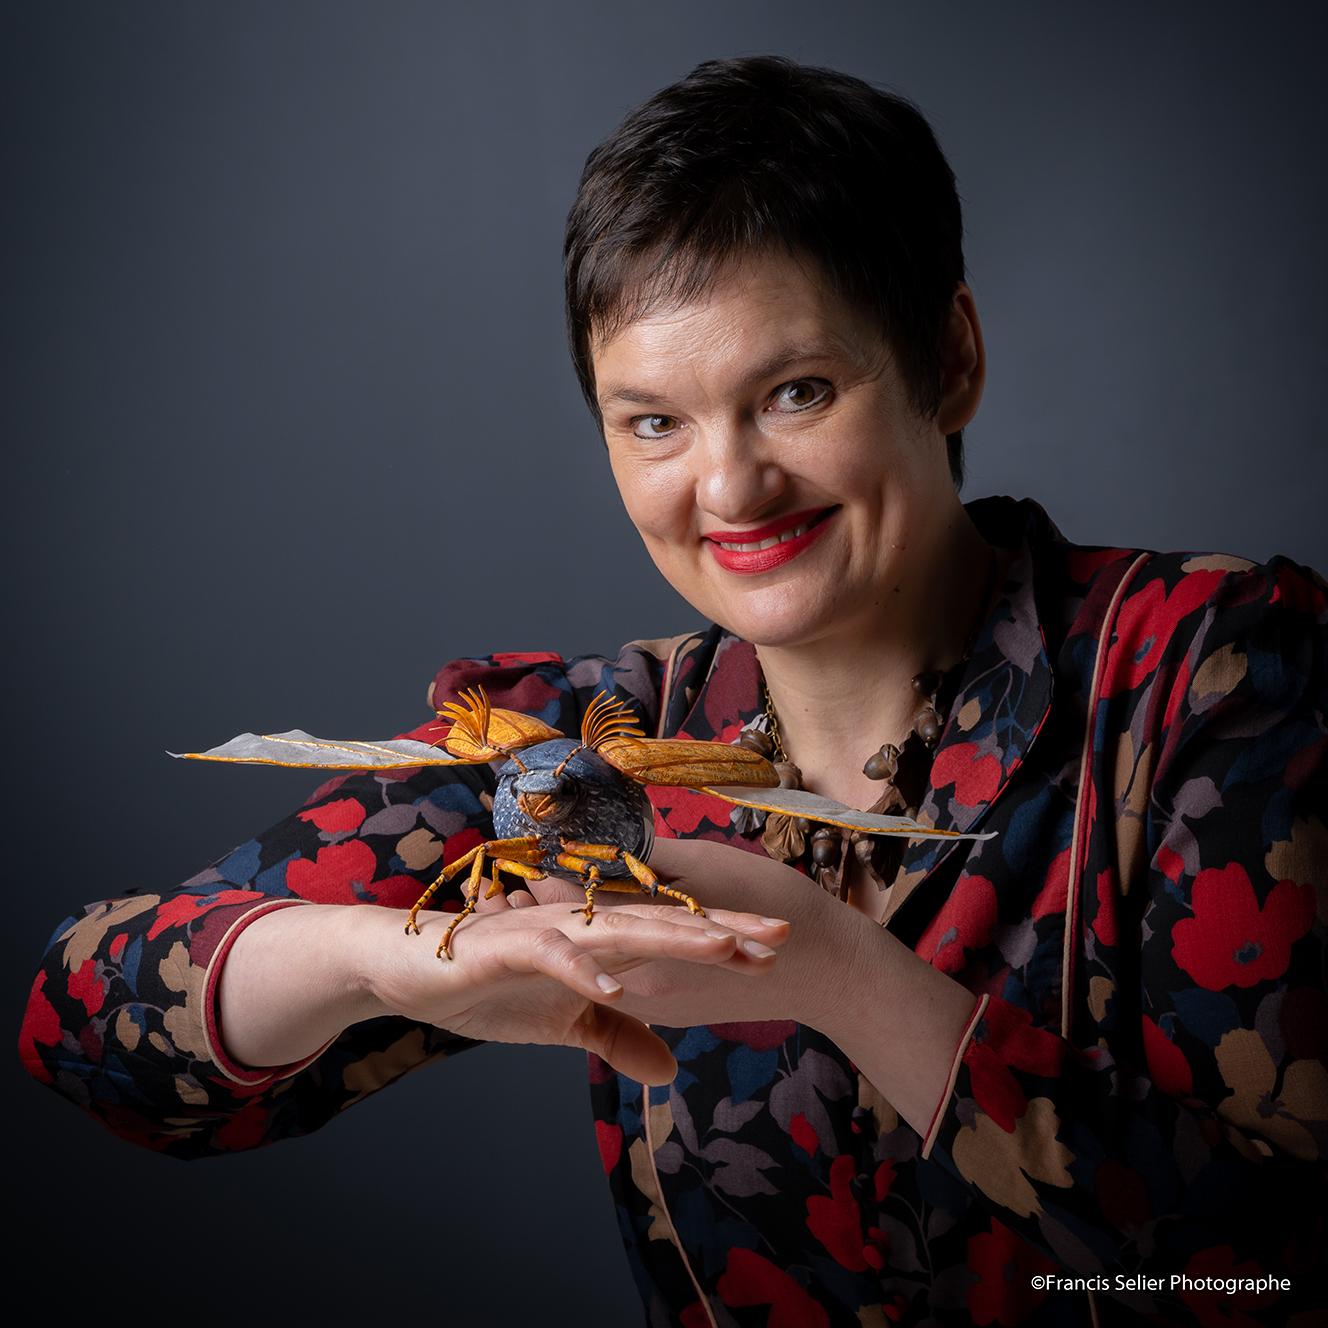 Anne-Lise Koehler